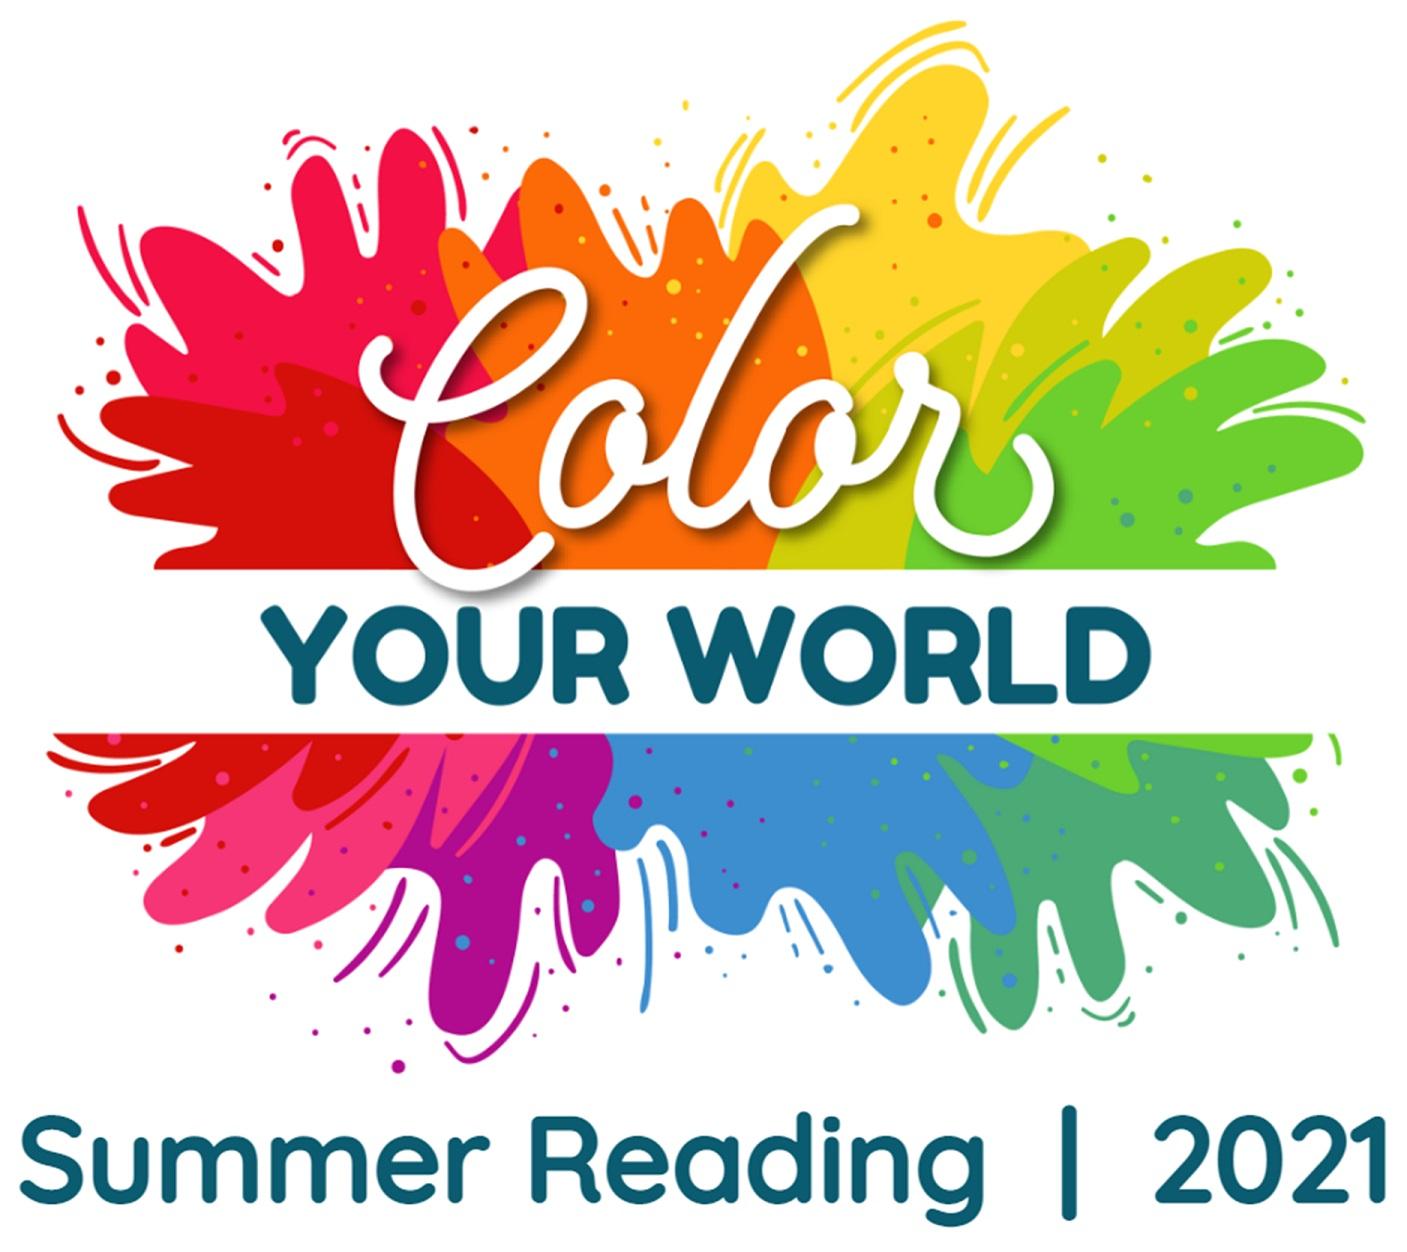 Color your world logo 1c11e0a6